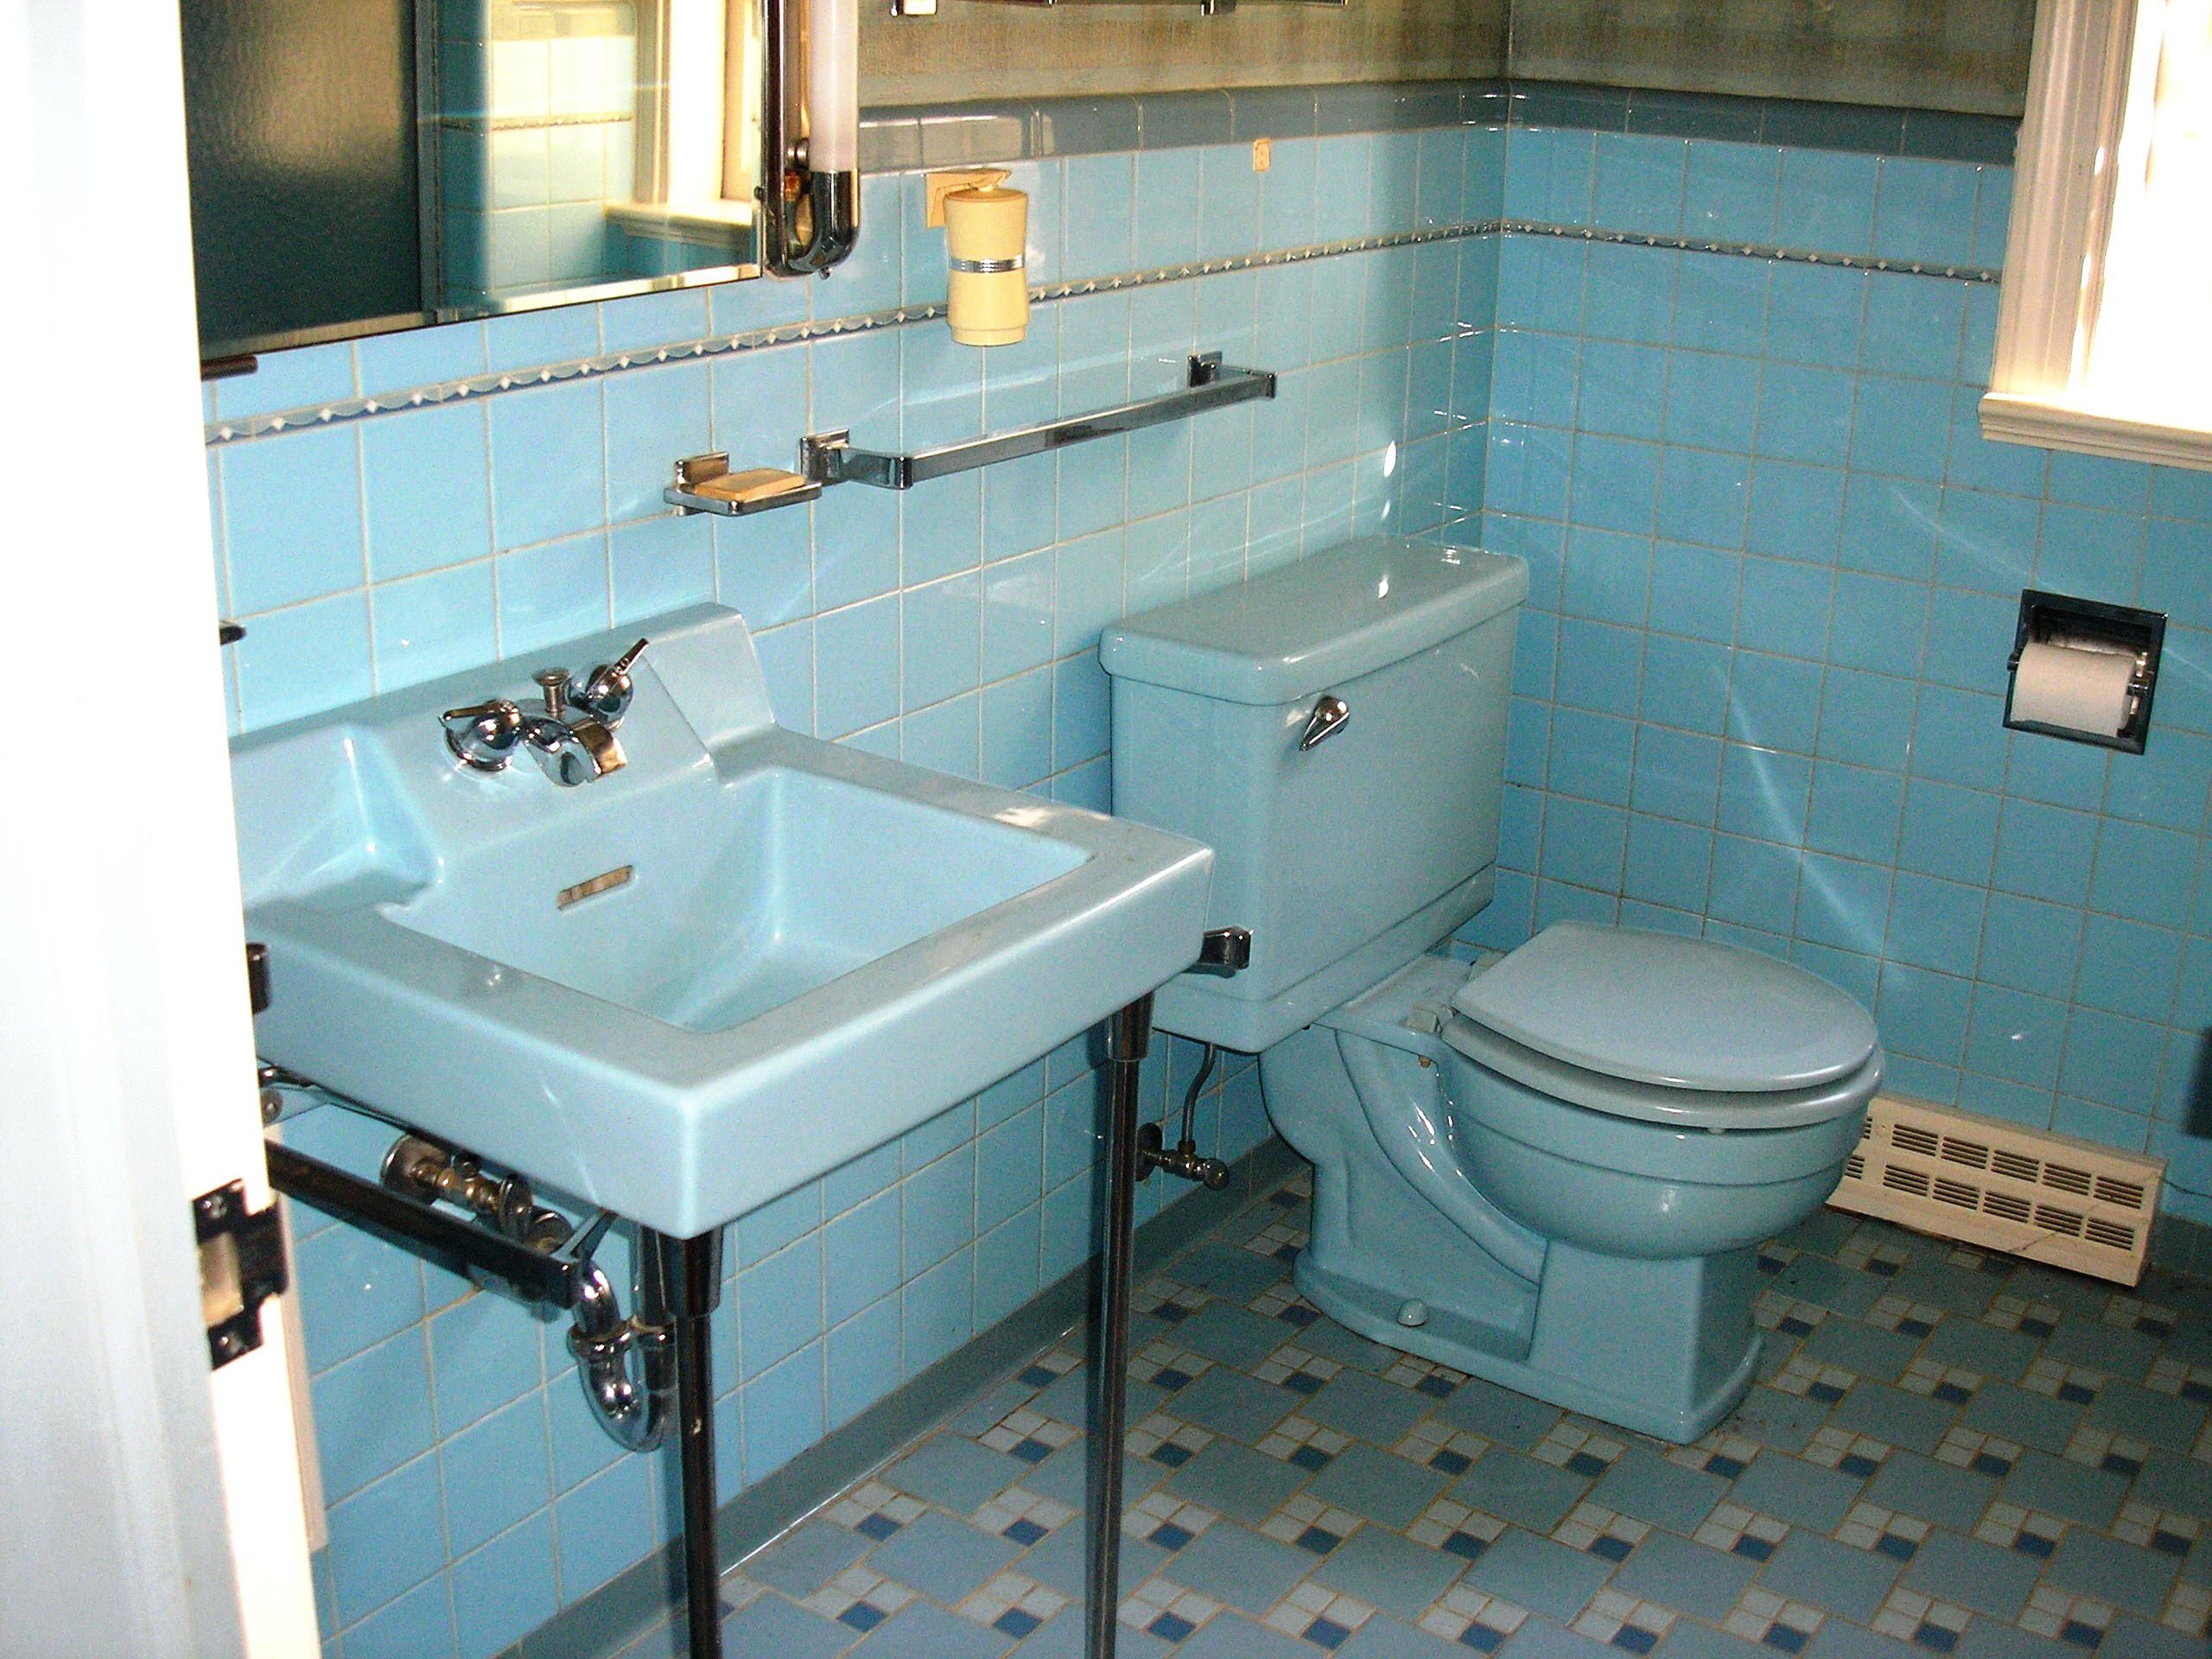 1950s Bathroom Replicating Alices Blue 50s Tile Floor Retro ...